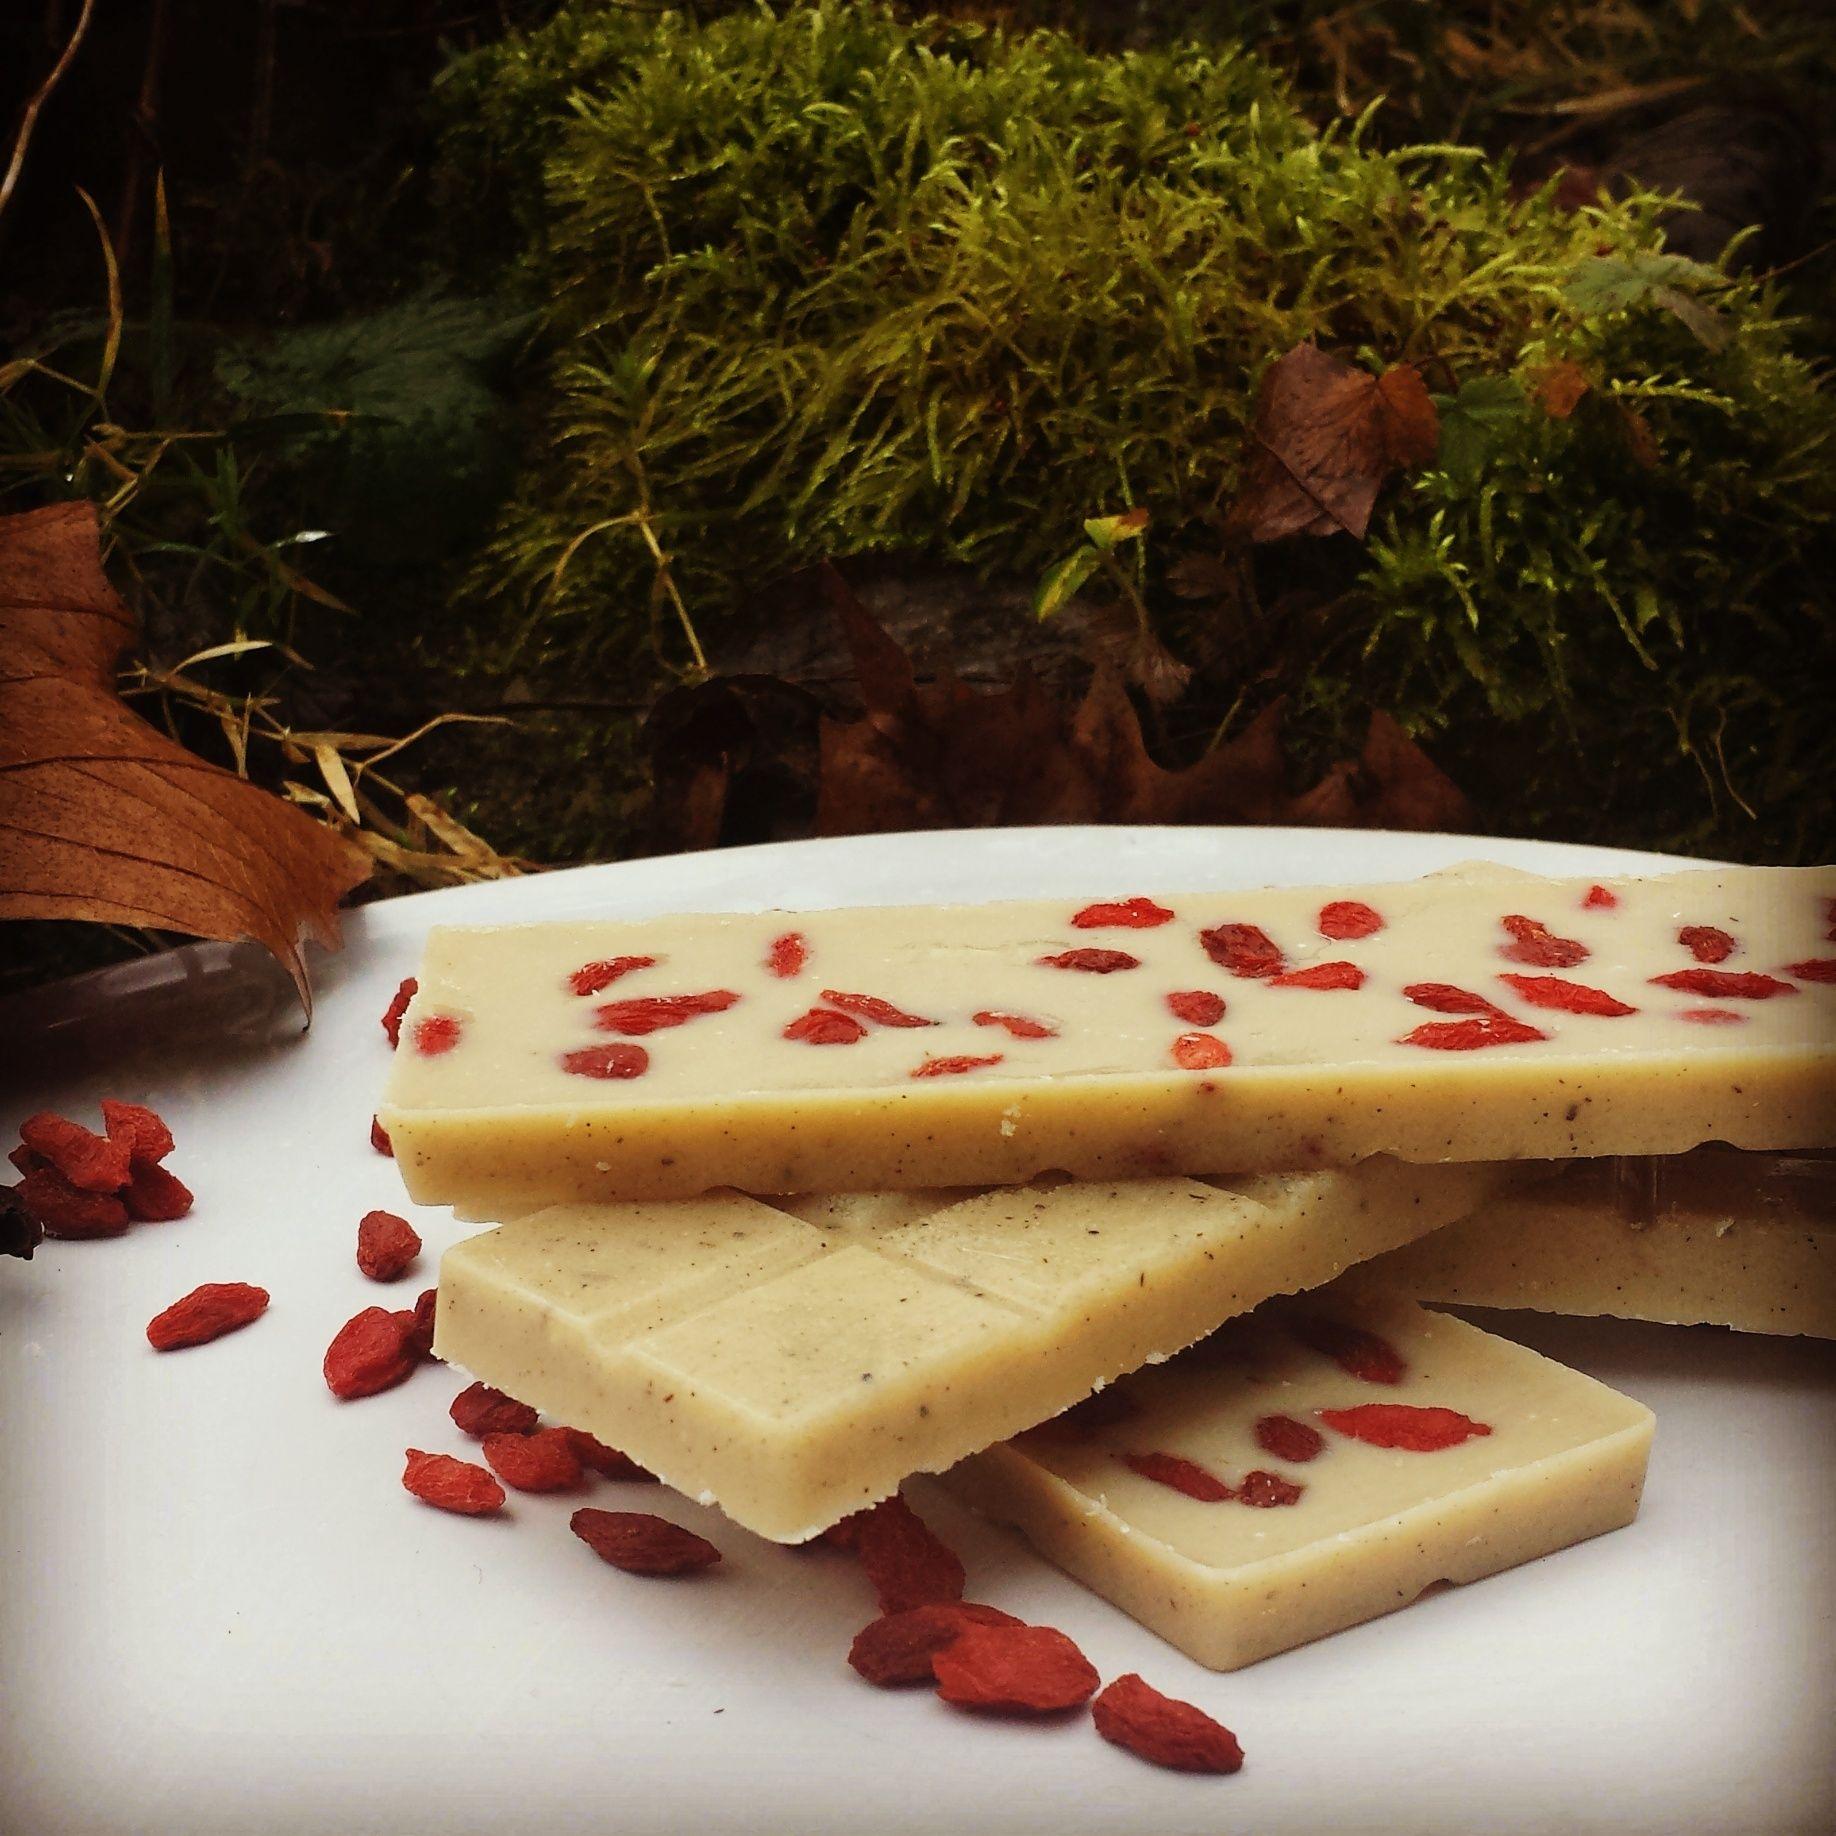 ¸.•*´RAW-Goji-Chocolate`*•.¸  Rezept gibt`s auf meinem Blog :) www.emmakochtgruen.weebly,com